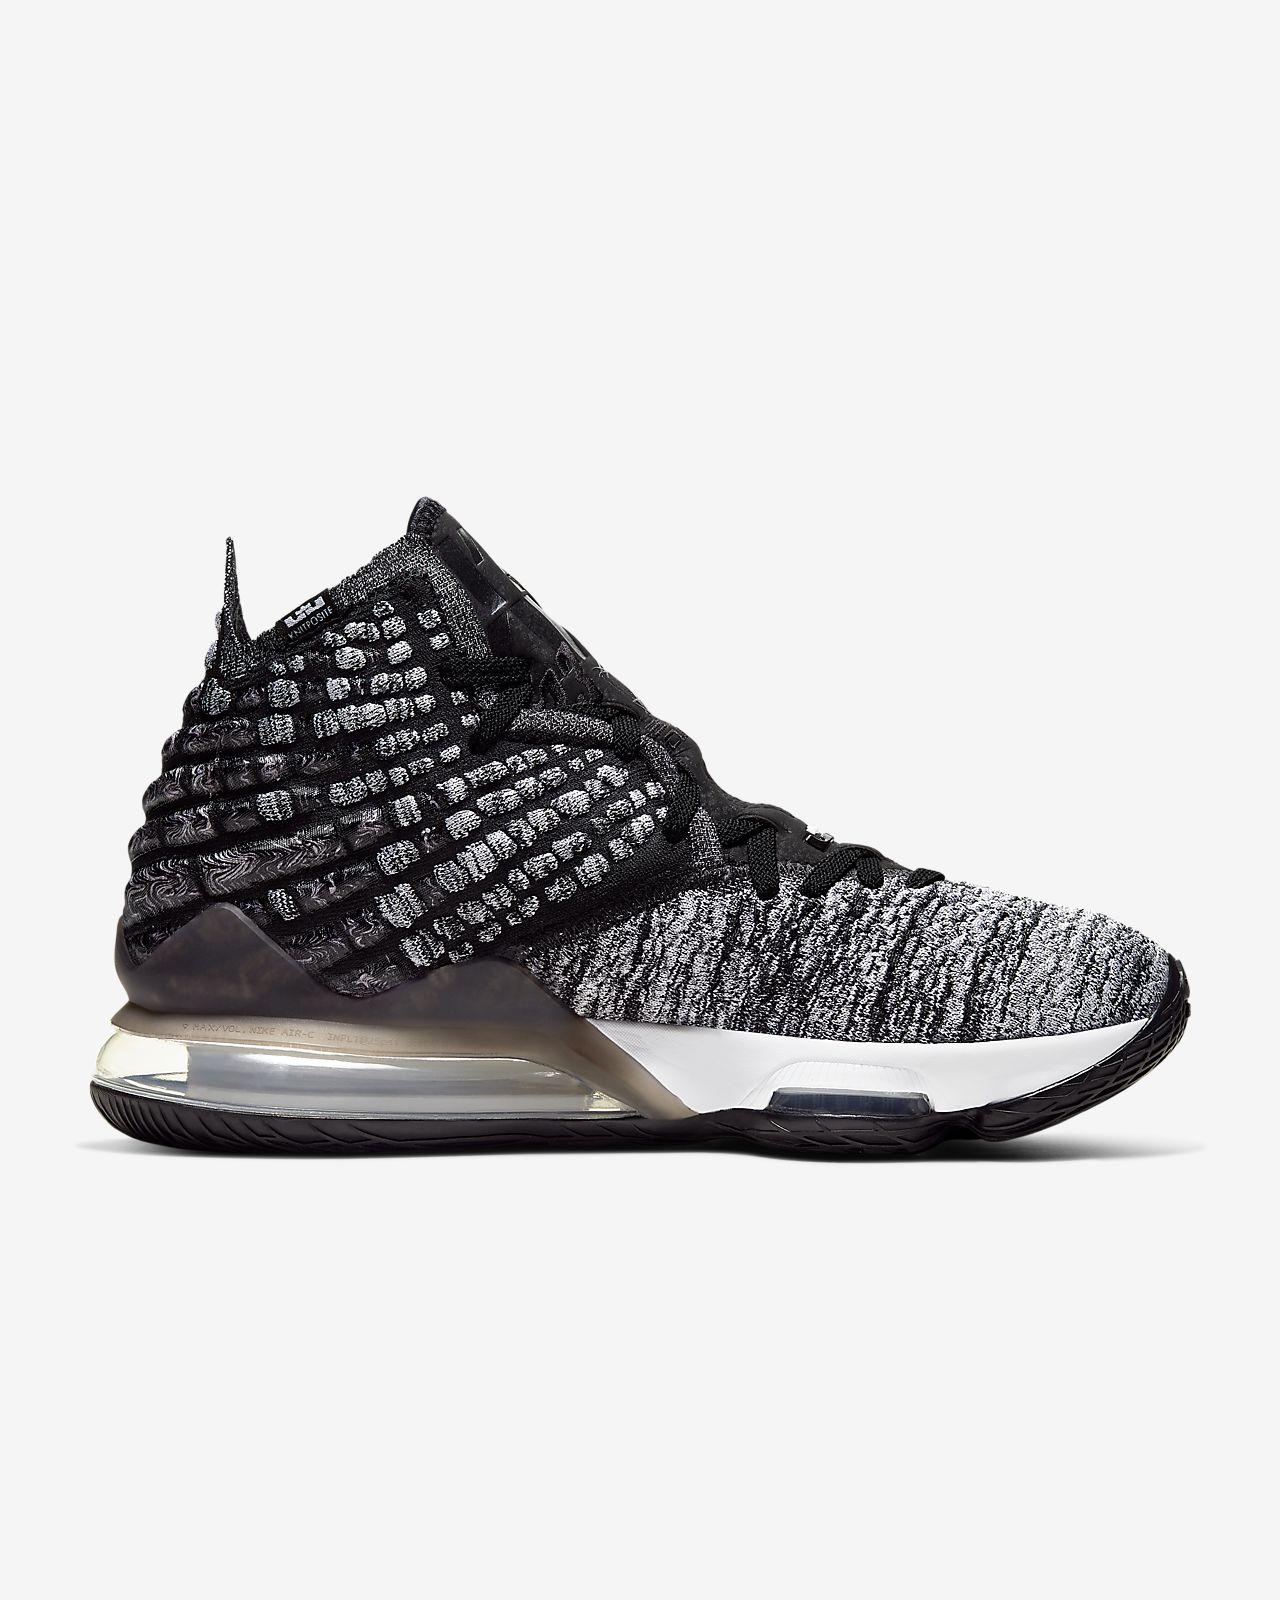 Nike LeBron 17 ´Lakers´ Release Date BQ3177 004 Men´s Nike